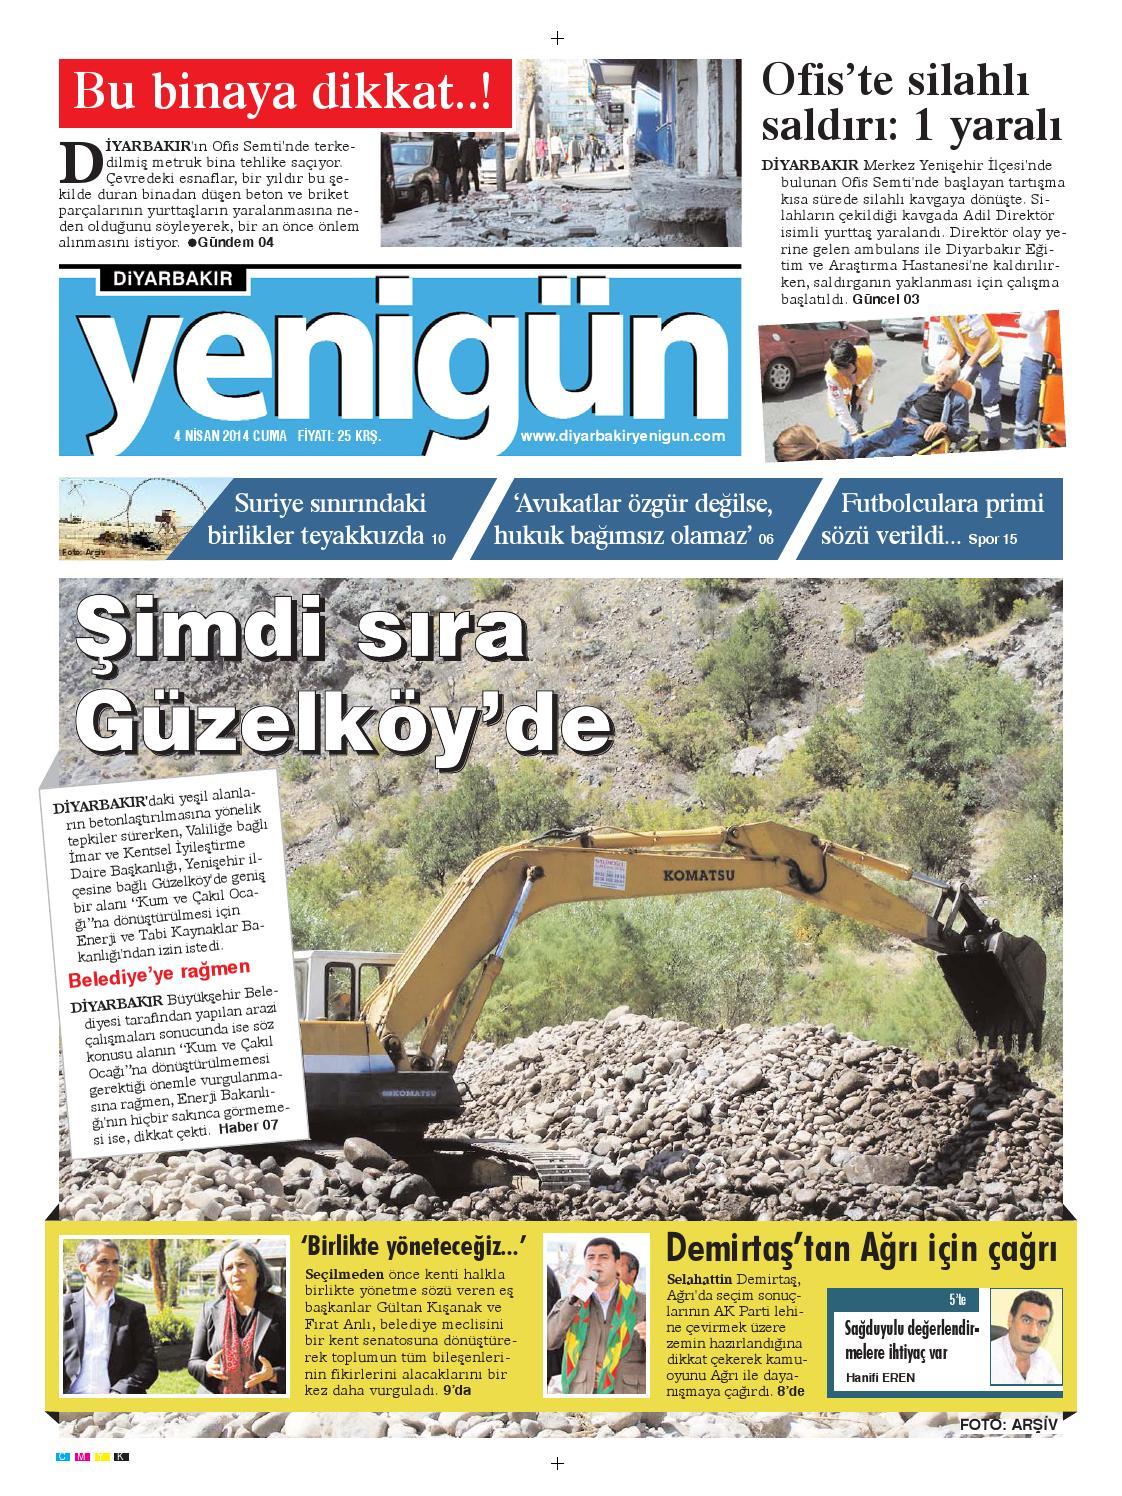 Diyarbakir Yenigun Gazetesi 4 Nisan 2014 By Osman Ergun Issuu